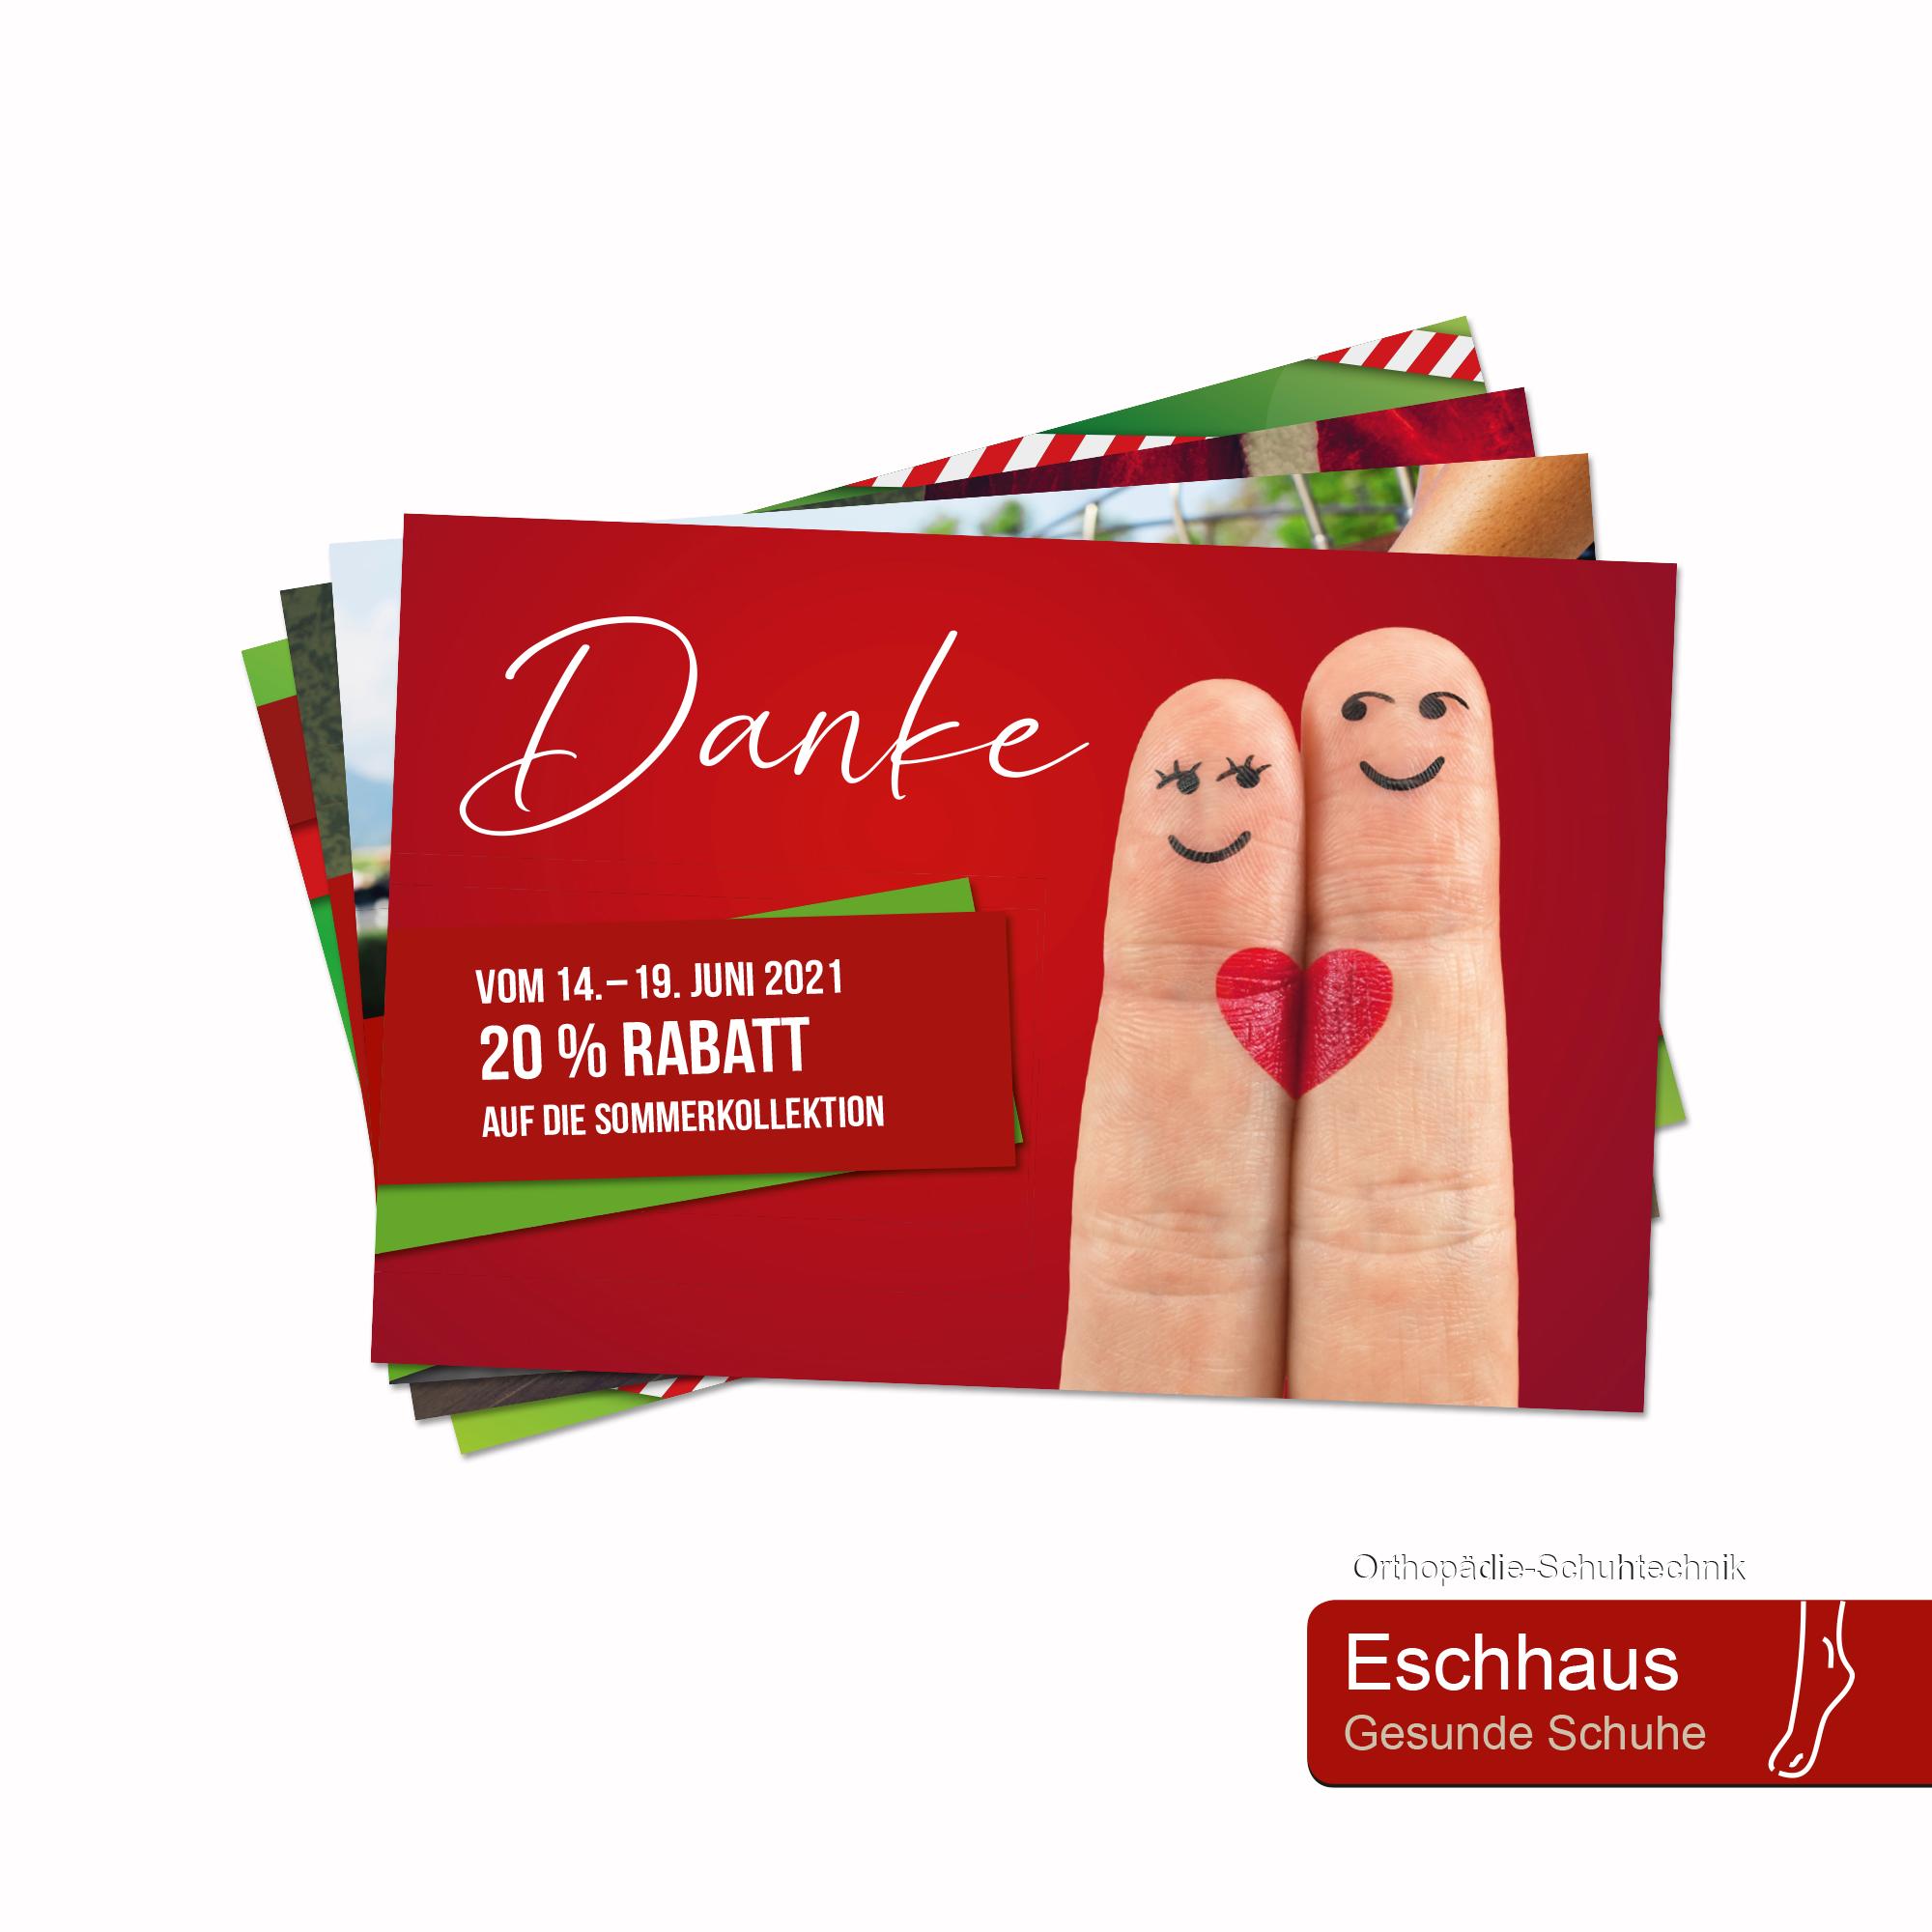 Calcanto Werbeagentur Referenz Eschhaus Postkarten